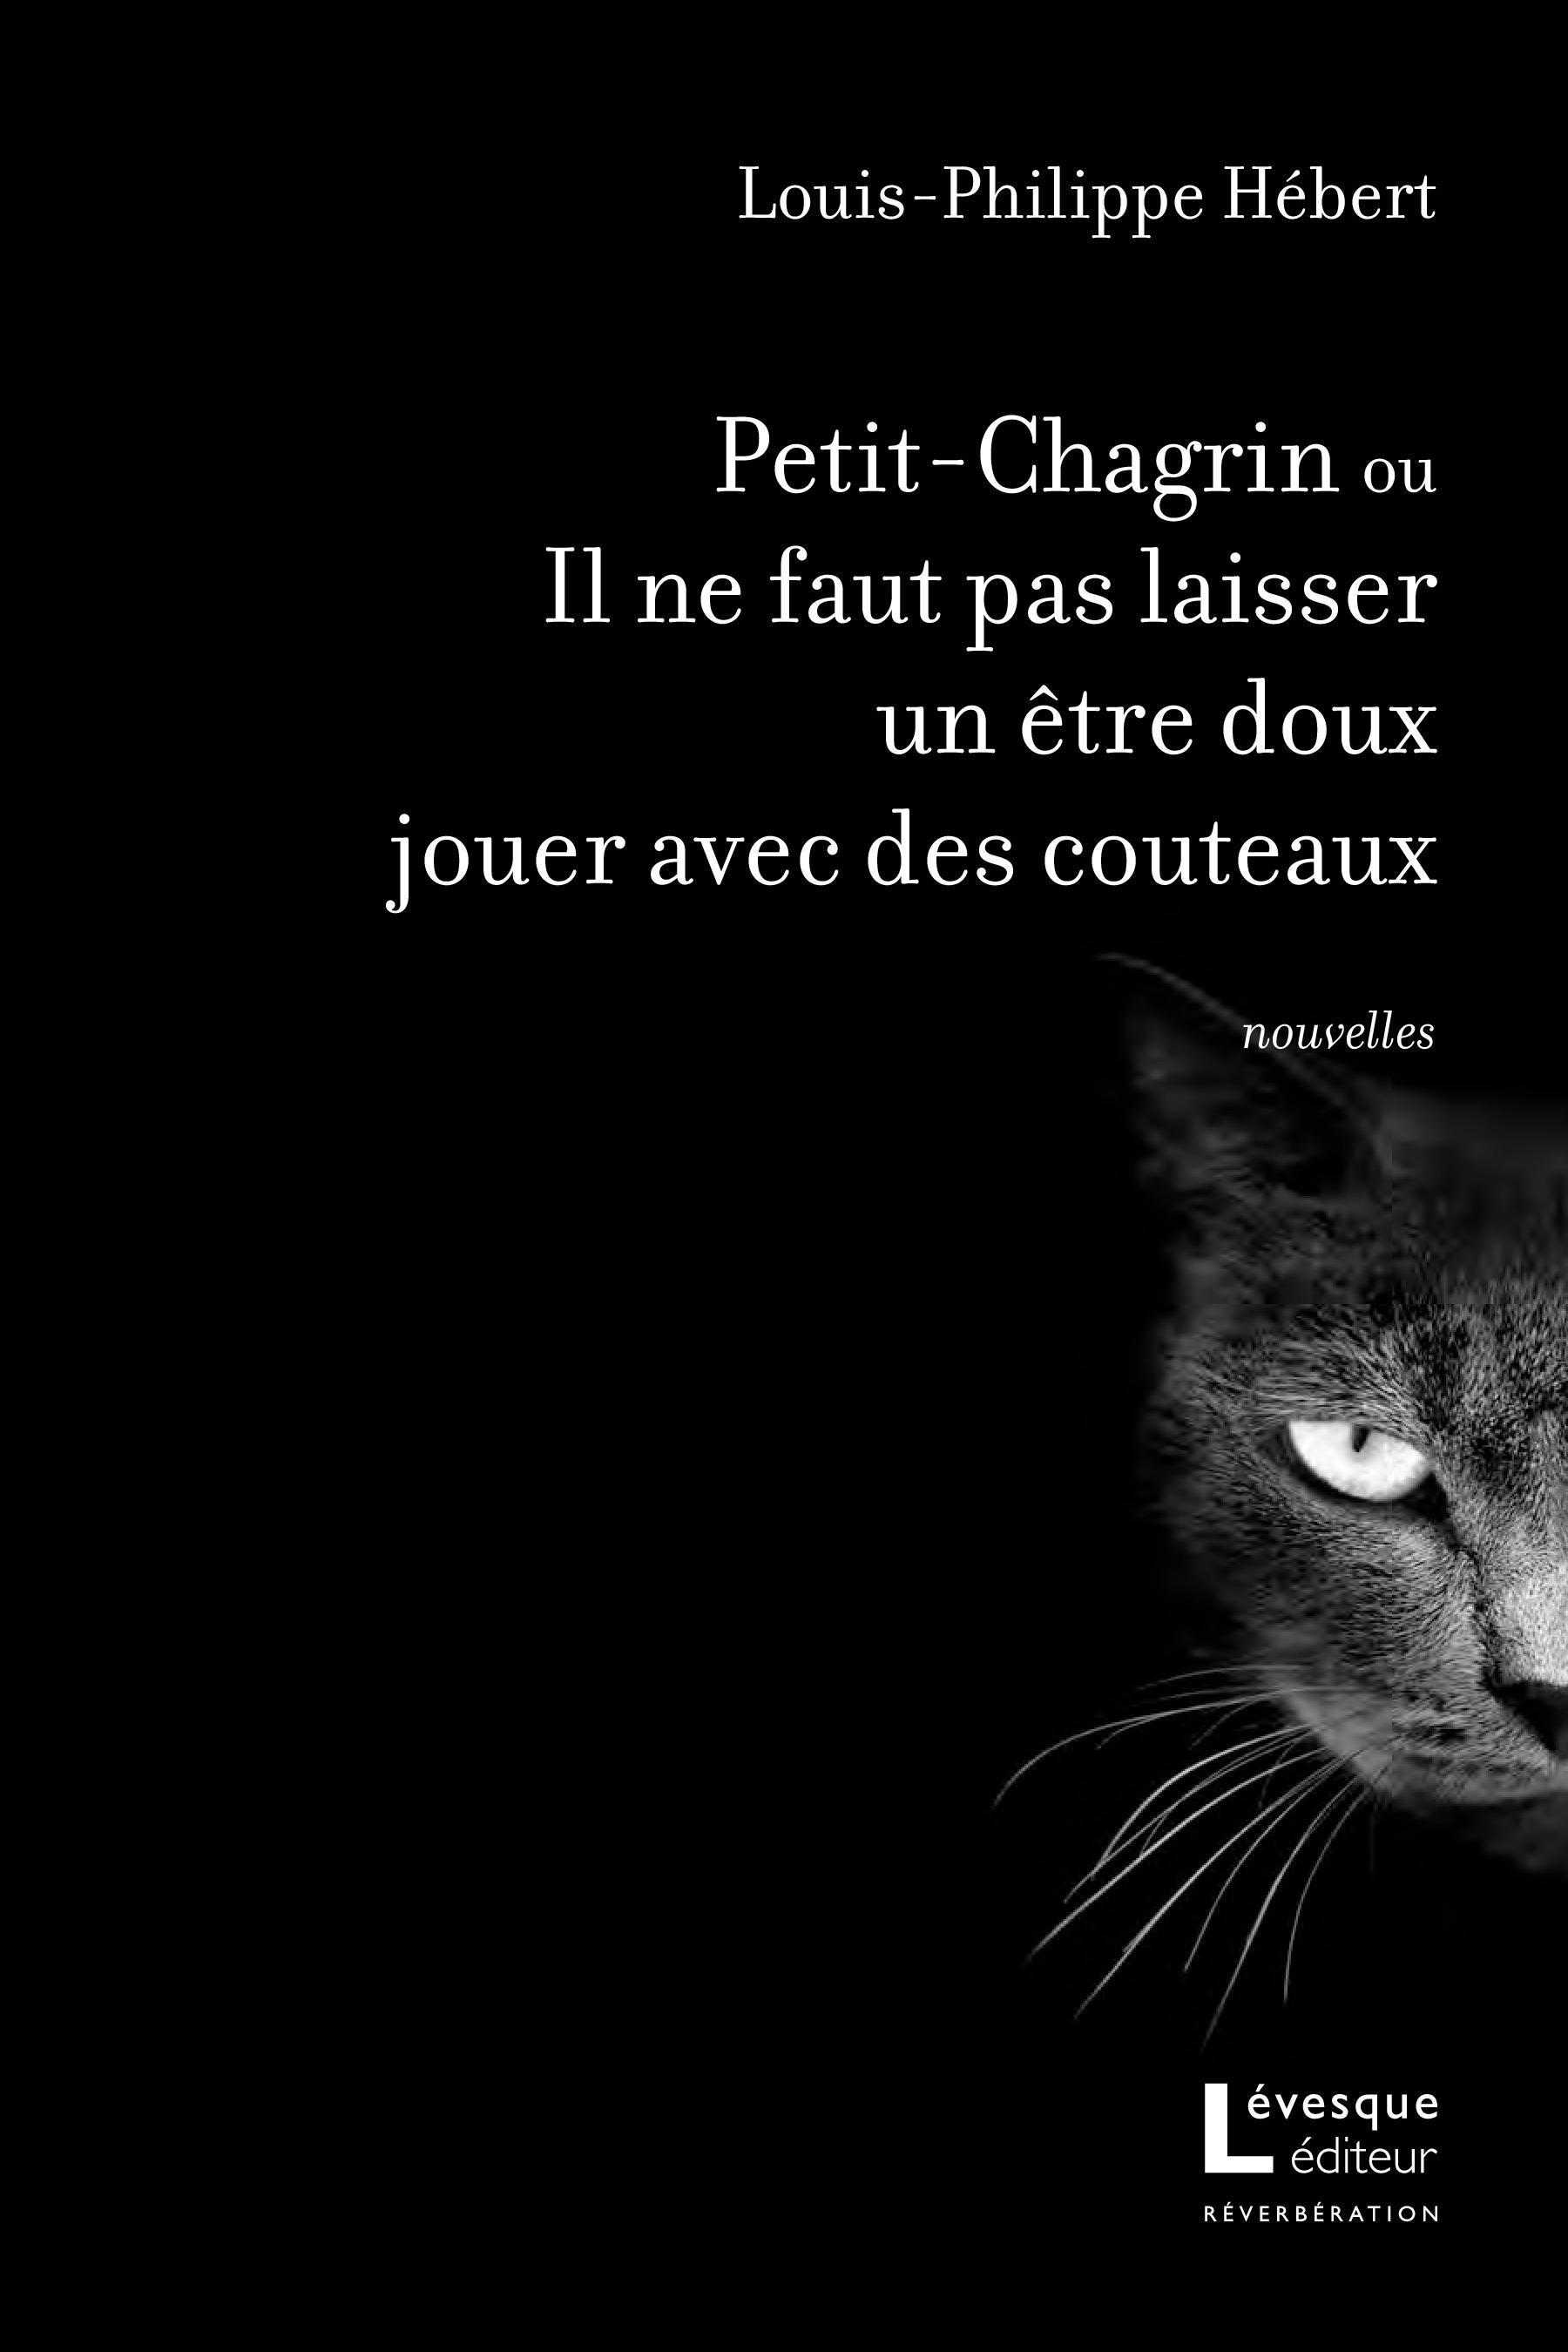 Petit-Chagrin